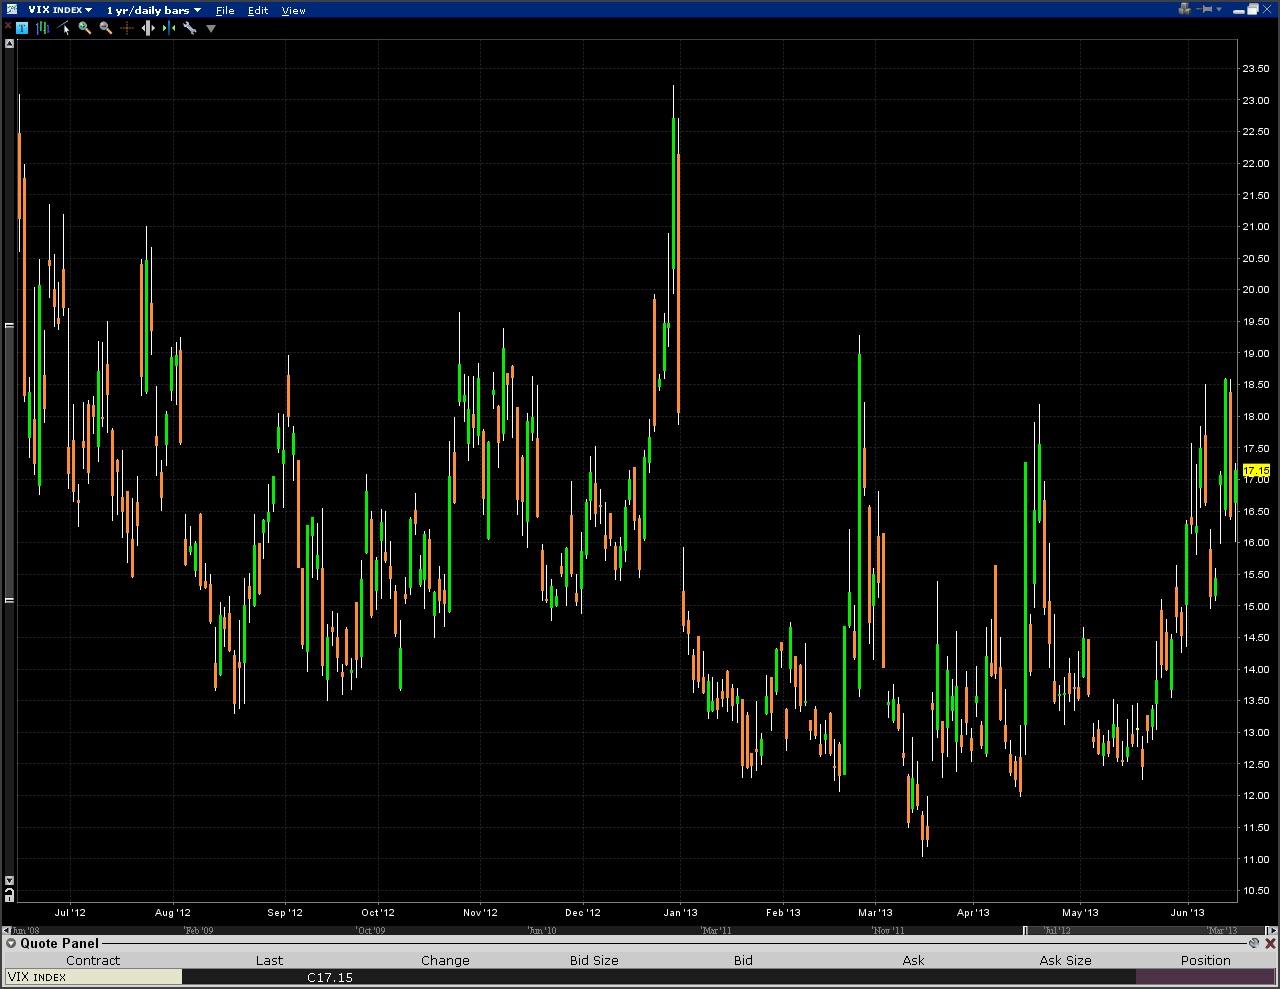 Vix spread trading strategies